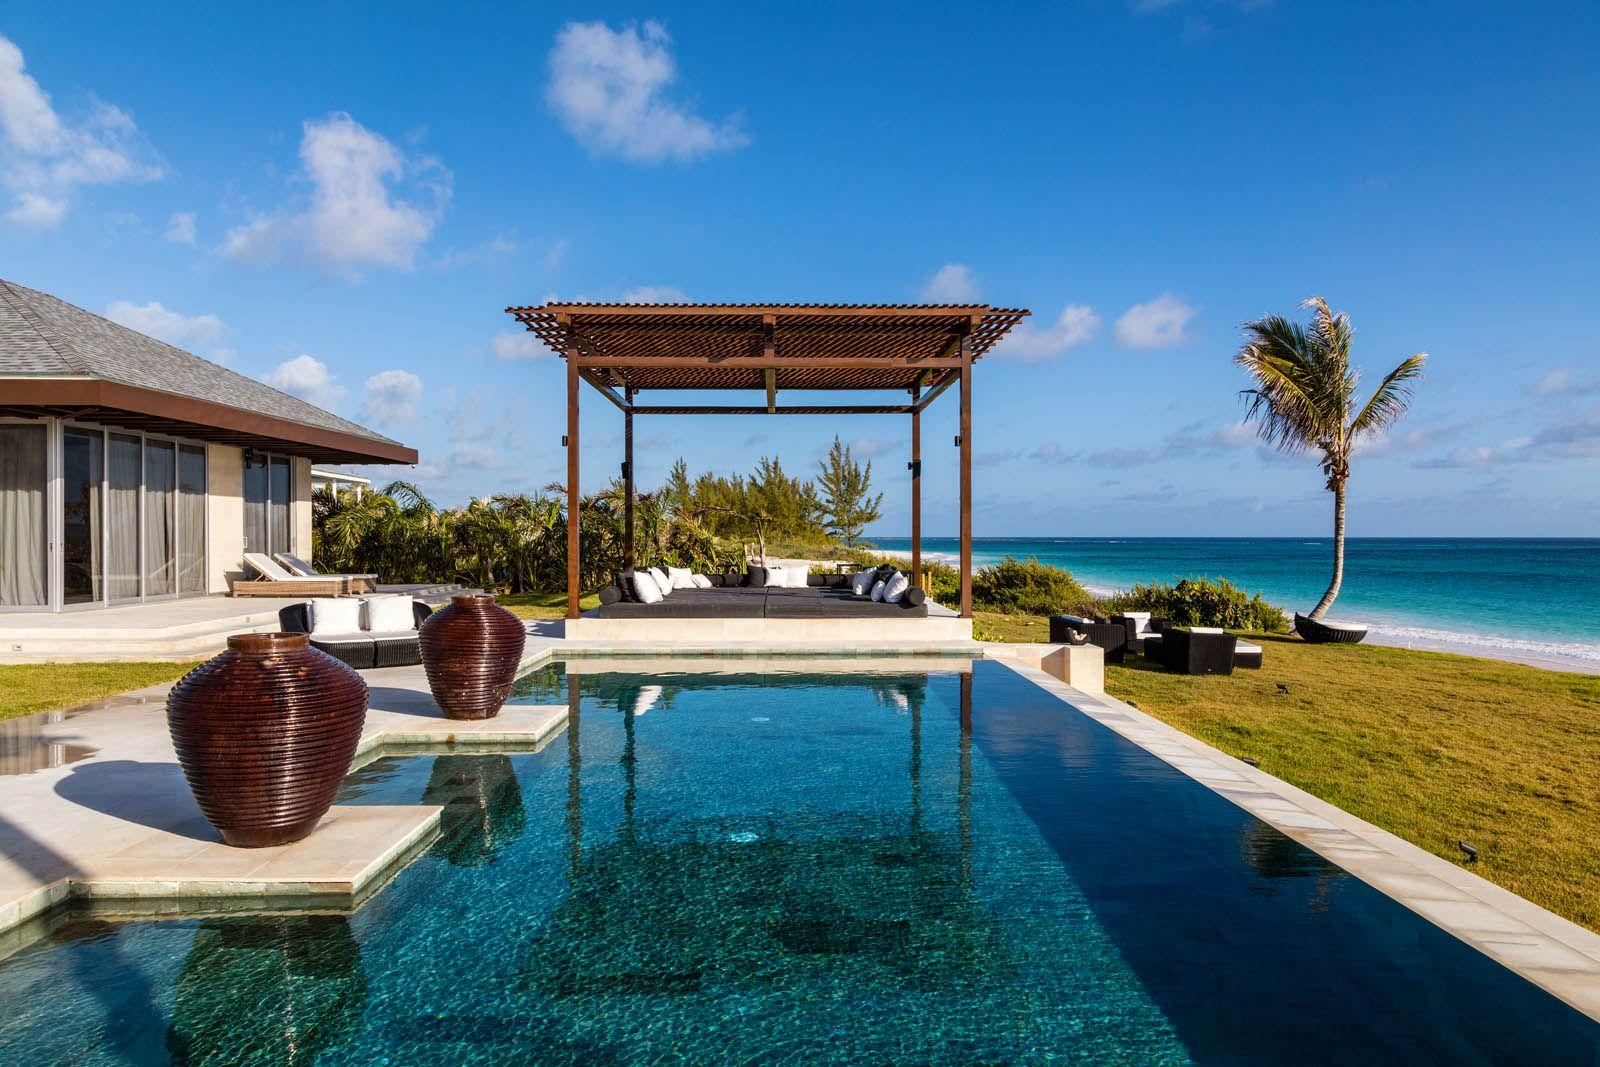 Ananda House: Ultra-luxury beachfront estate with pool on ...